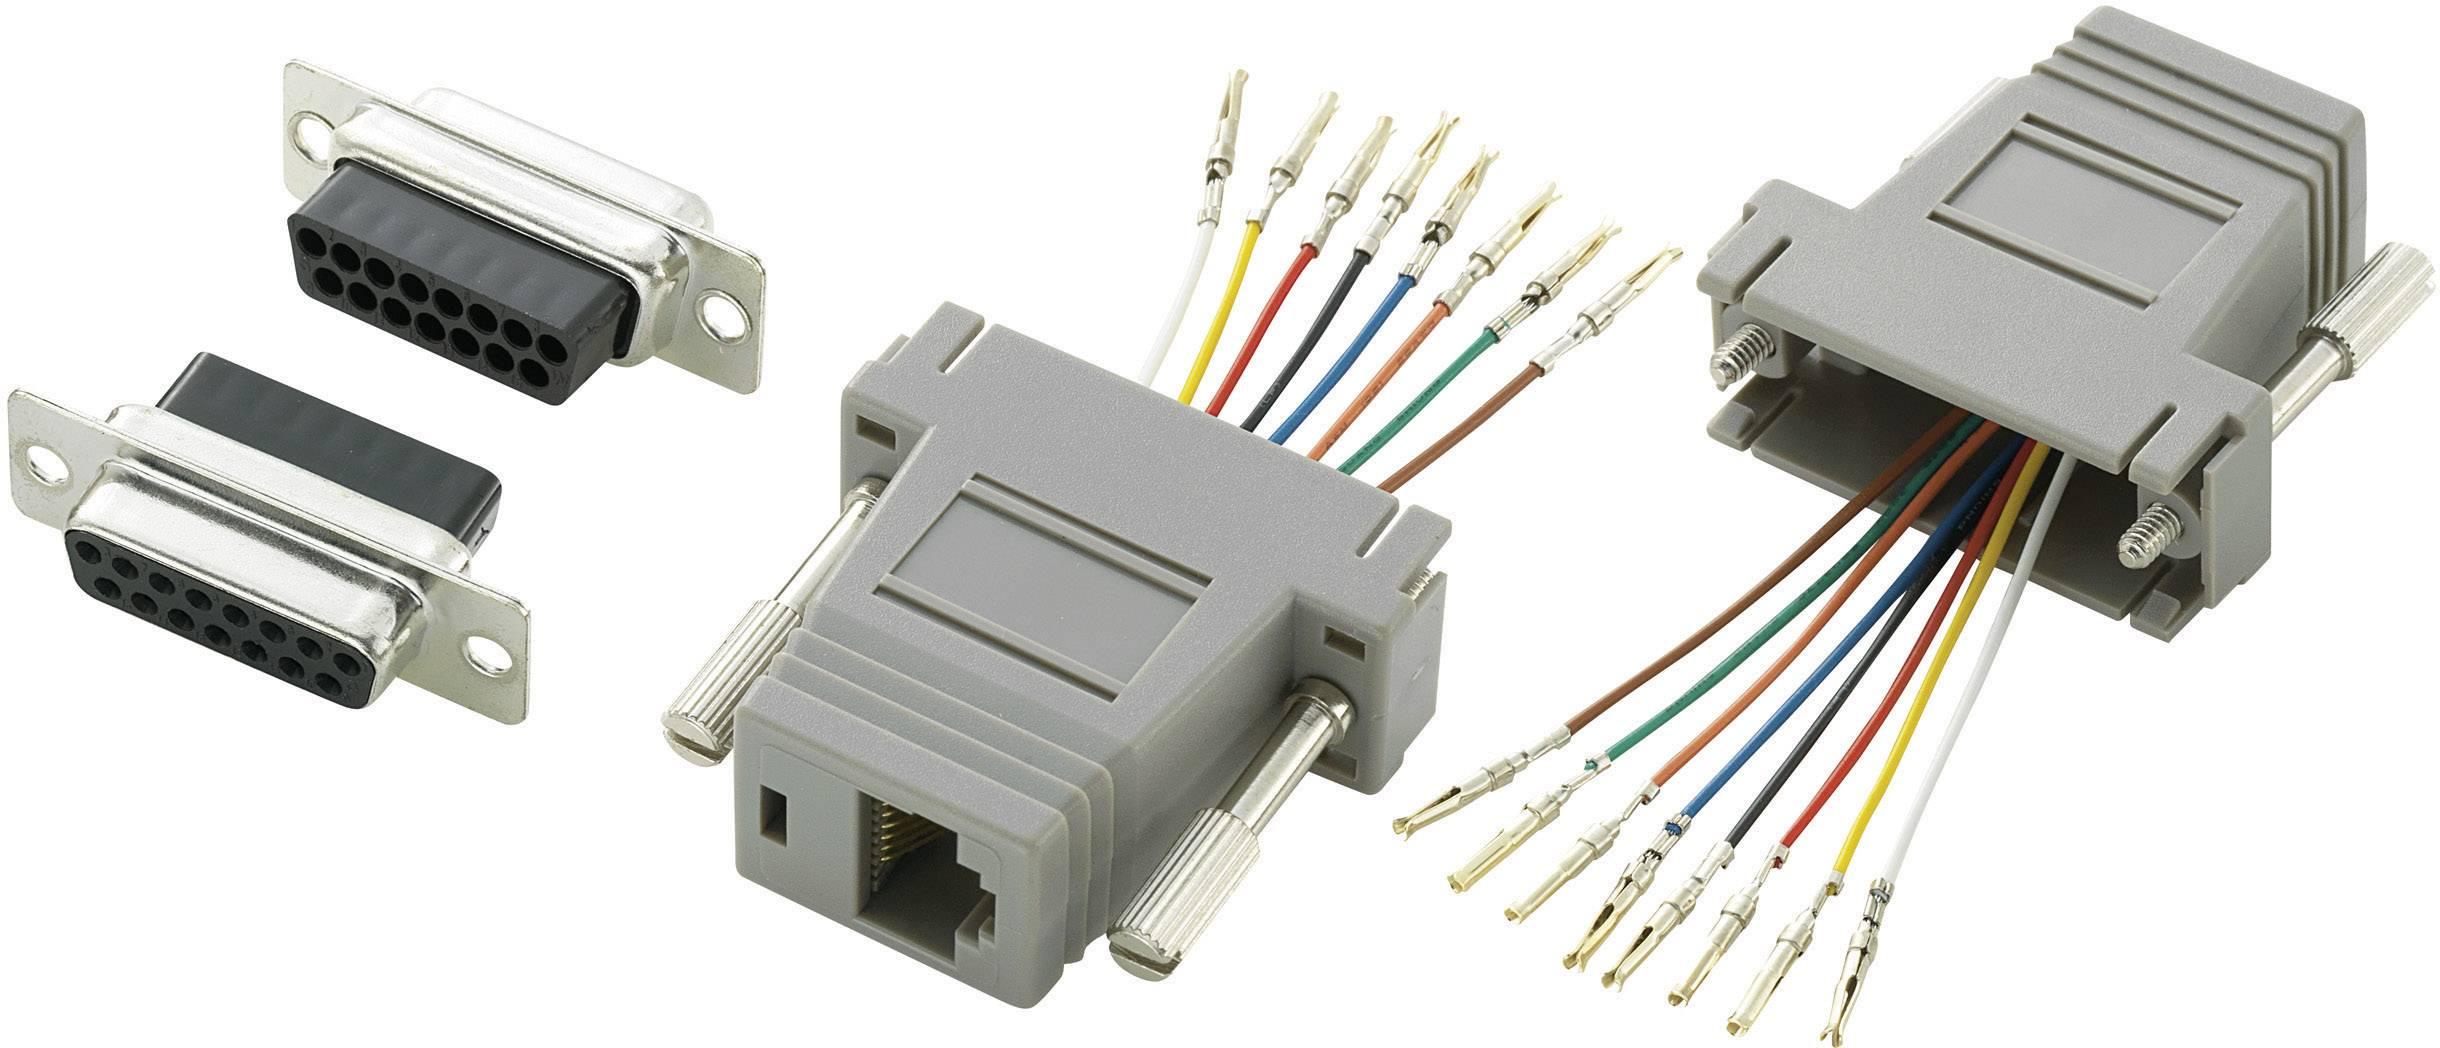 D-SUB adaptér D-SUB zásuvka 15pólová - RJ45 zásvuka Conrad Components 1 ks